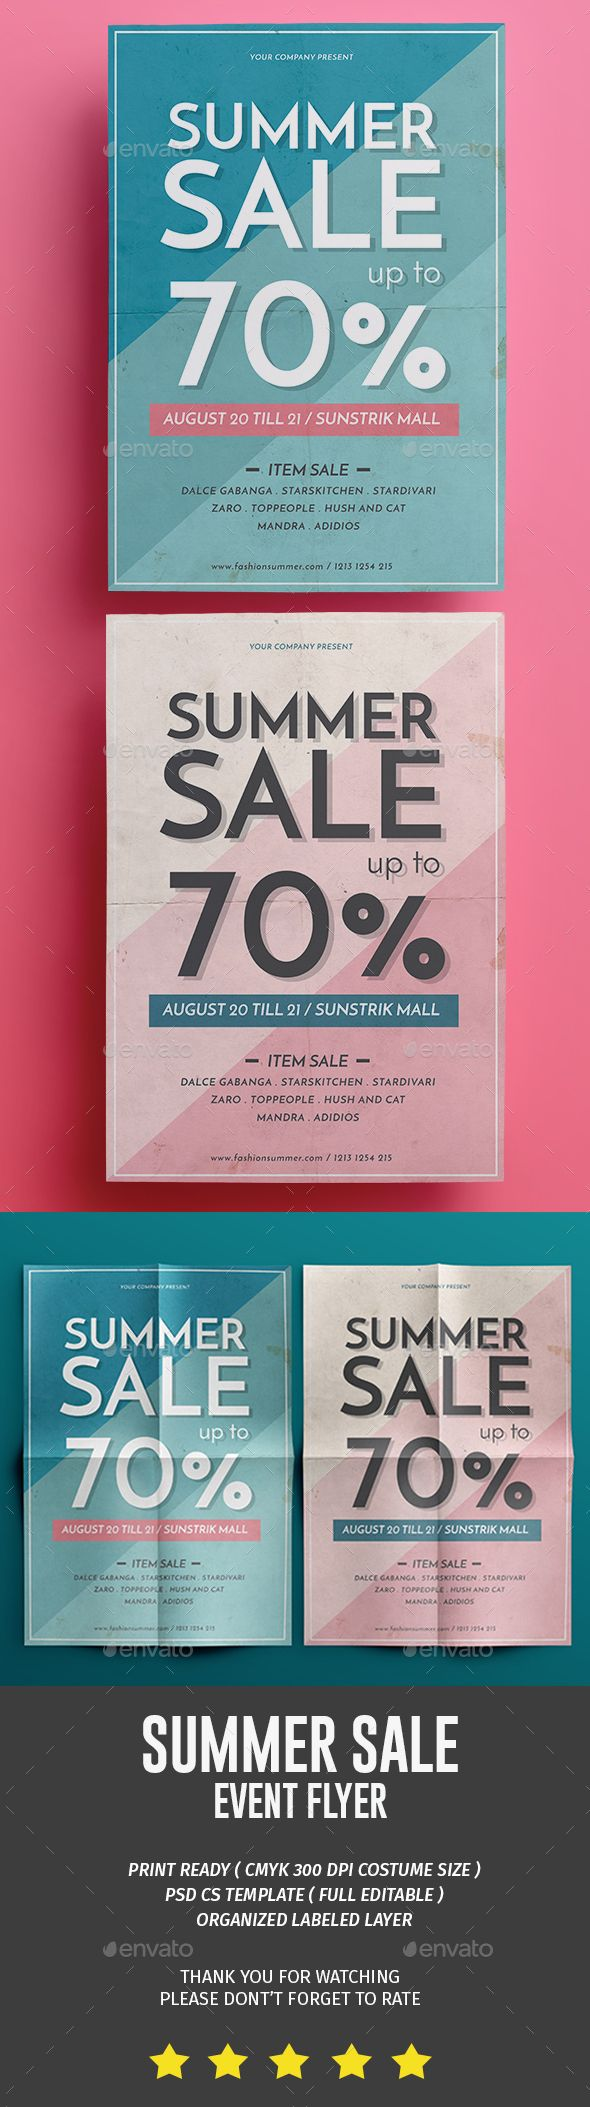 summer flyer flyer template summer and flyers summer flyer template psd here graphicriver net